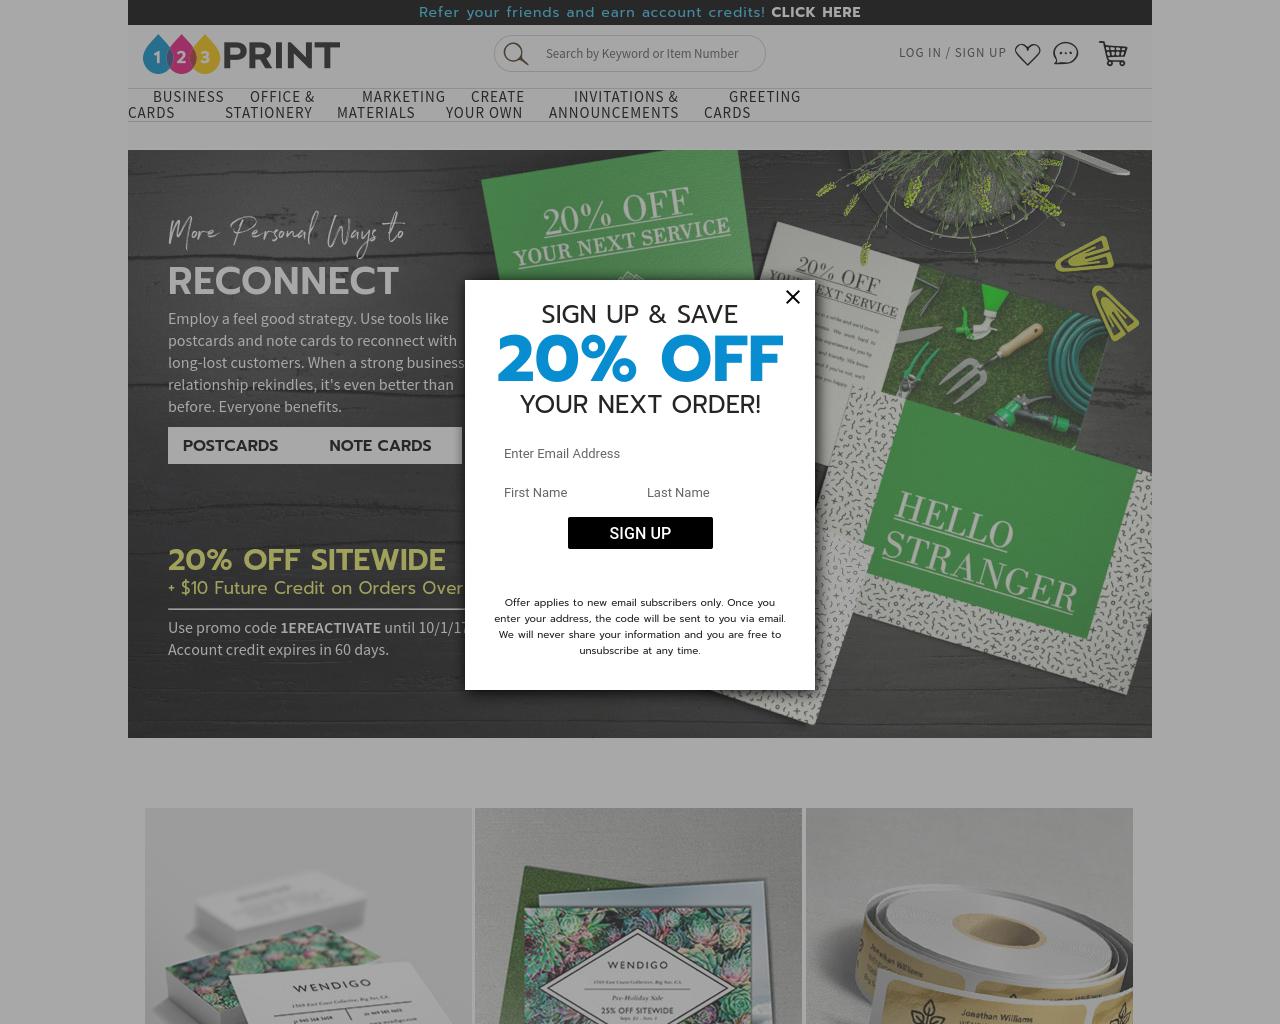 123Print-Advertising-Reviews-Pricing